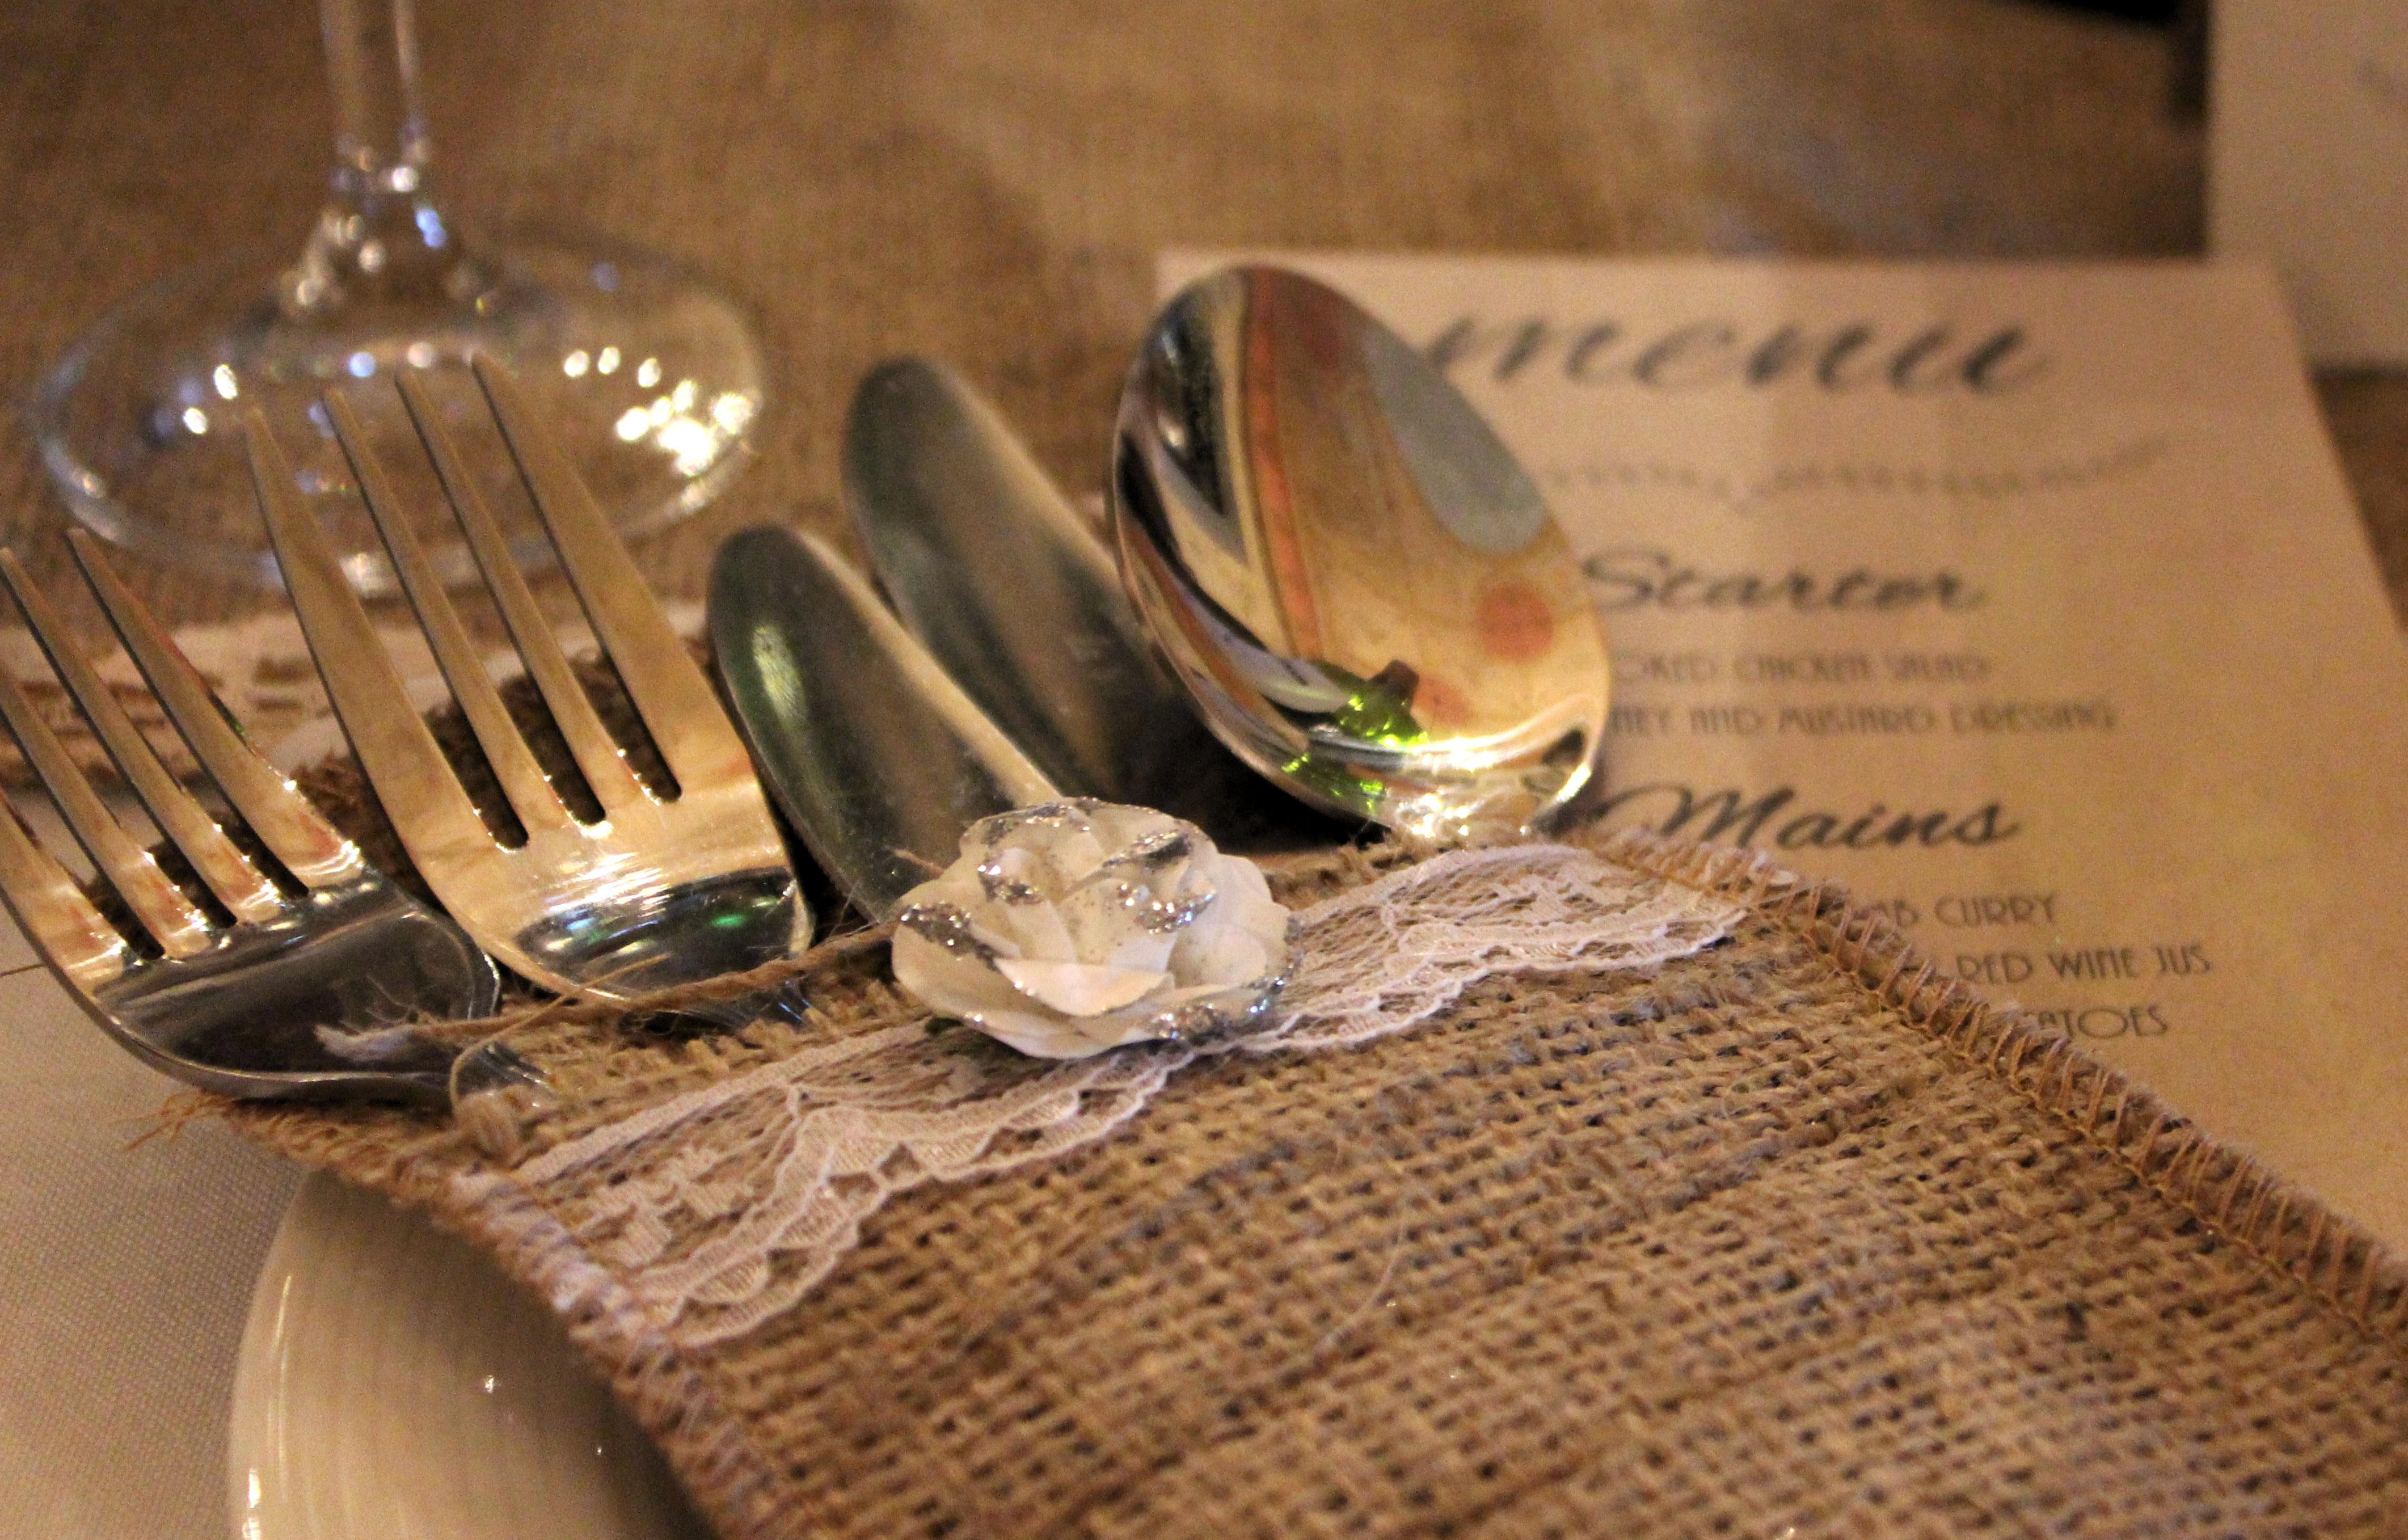 Free Images Board Wine Restaurant Celebration Decoration Meal - Restaurant table cards